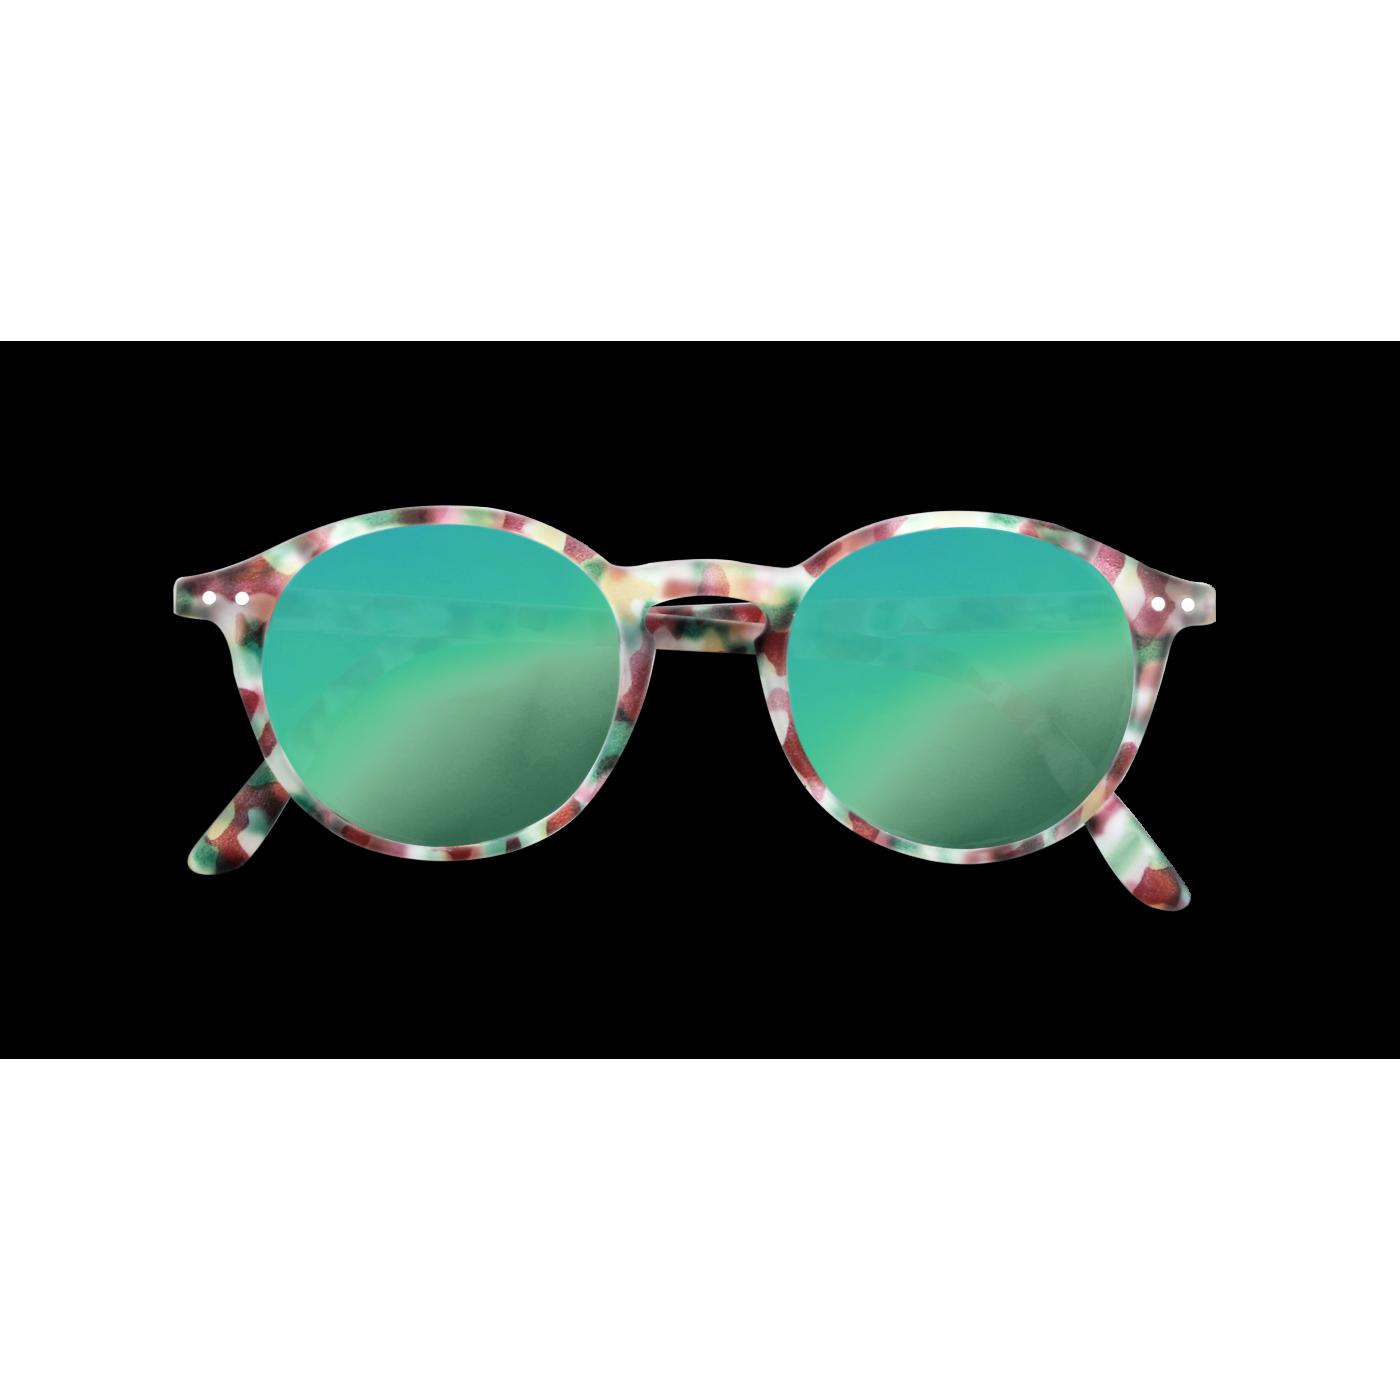 SUN JUNIOR #D Green Tortoise Mirror